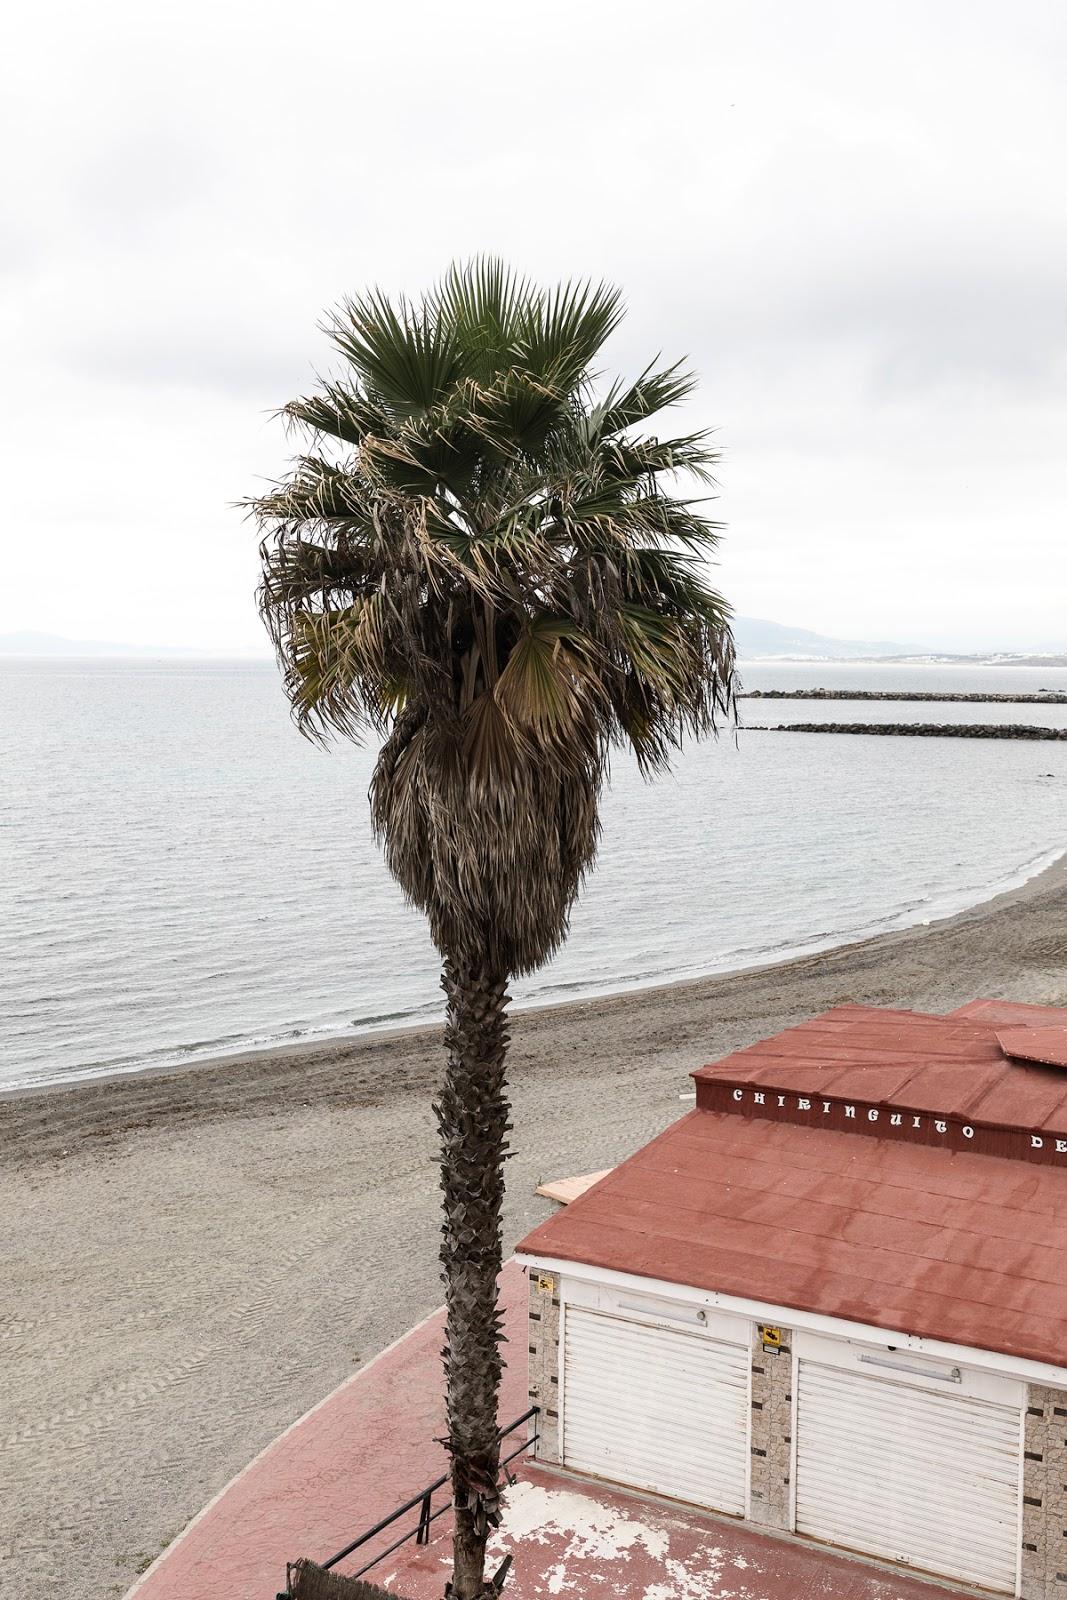 Ceuta, Spain, Africa, Espanja, matkailu, matkustus, rantaloma, lomakohde, valokuvaaja, photographer, Frida Steiner, Visualaddict, visualaddictfrida, valokuvaus, ranta, hiekkaranta, ocean, meri, sea